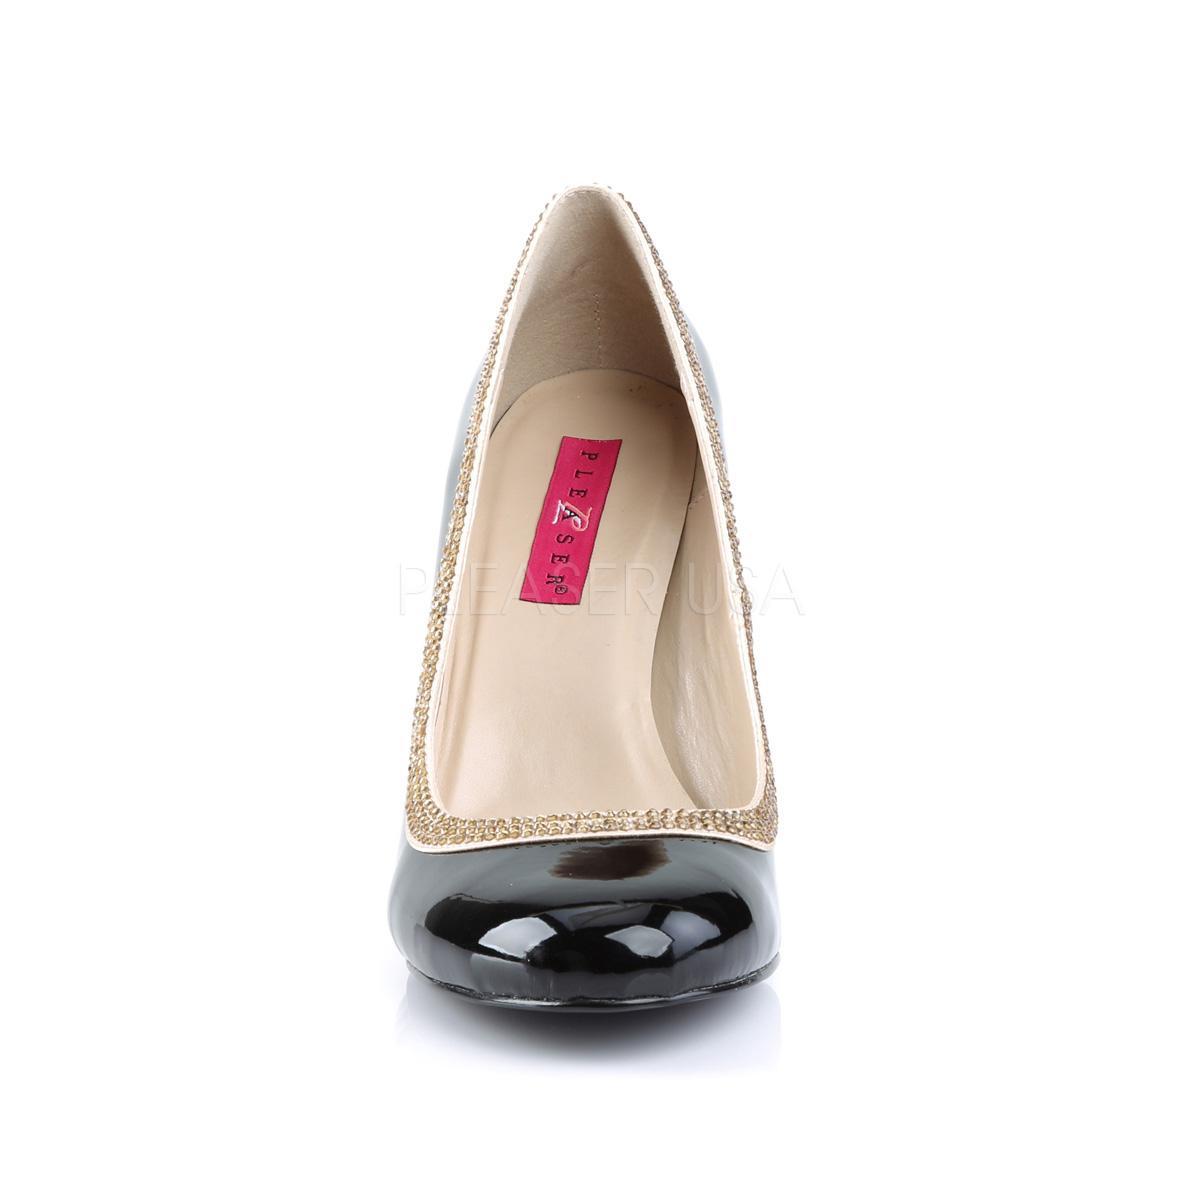 Pleaser Pink Label QUEEN-04 4inch Heel, Round Toe w/ Rhinestone Accent◆取り寄せ